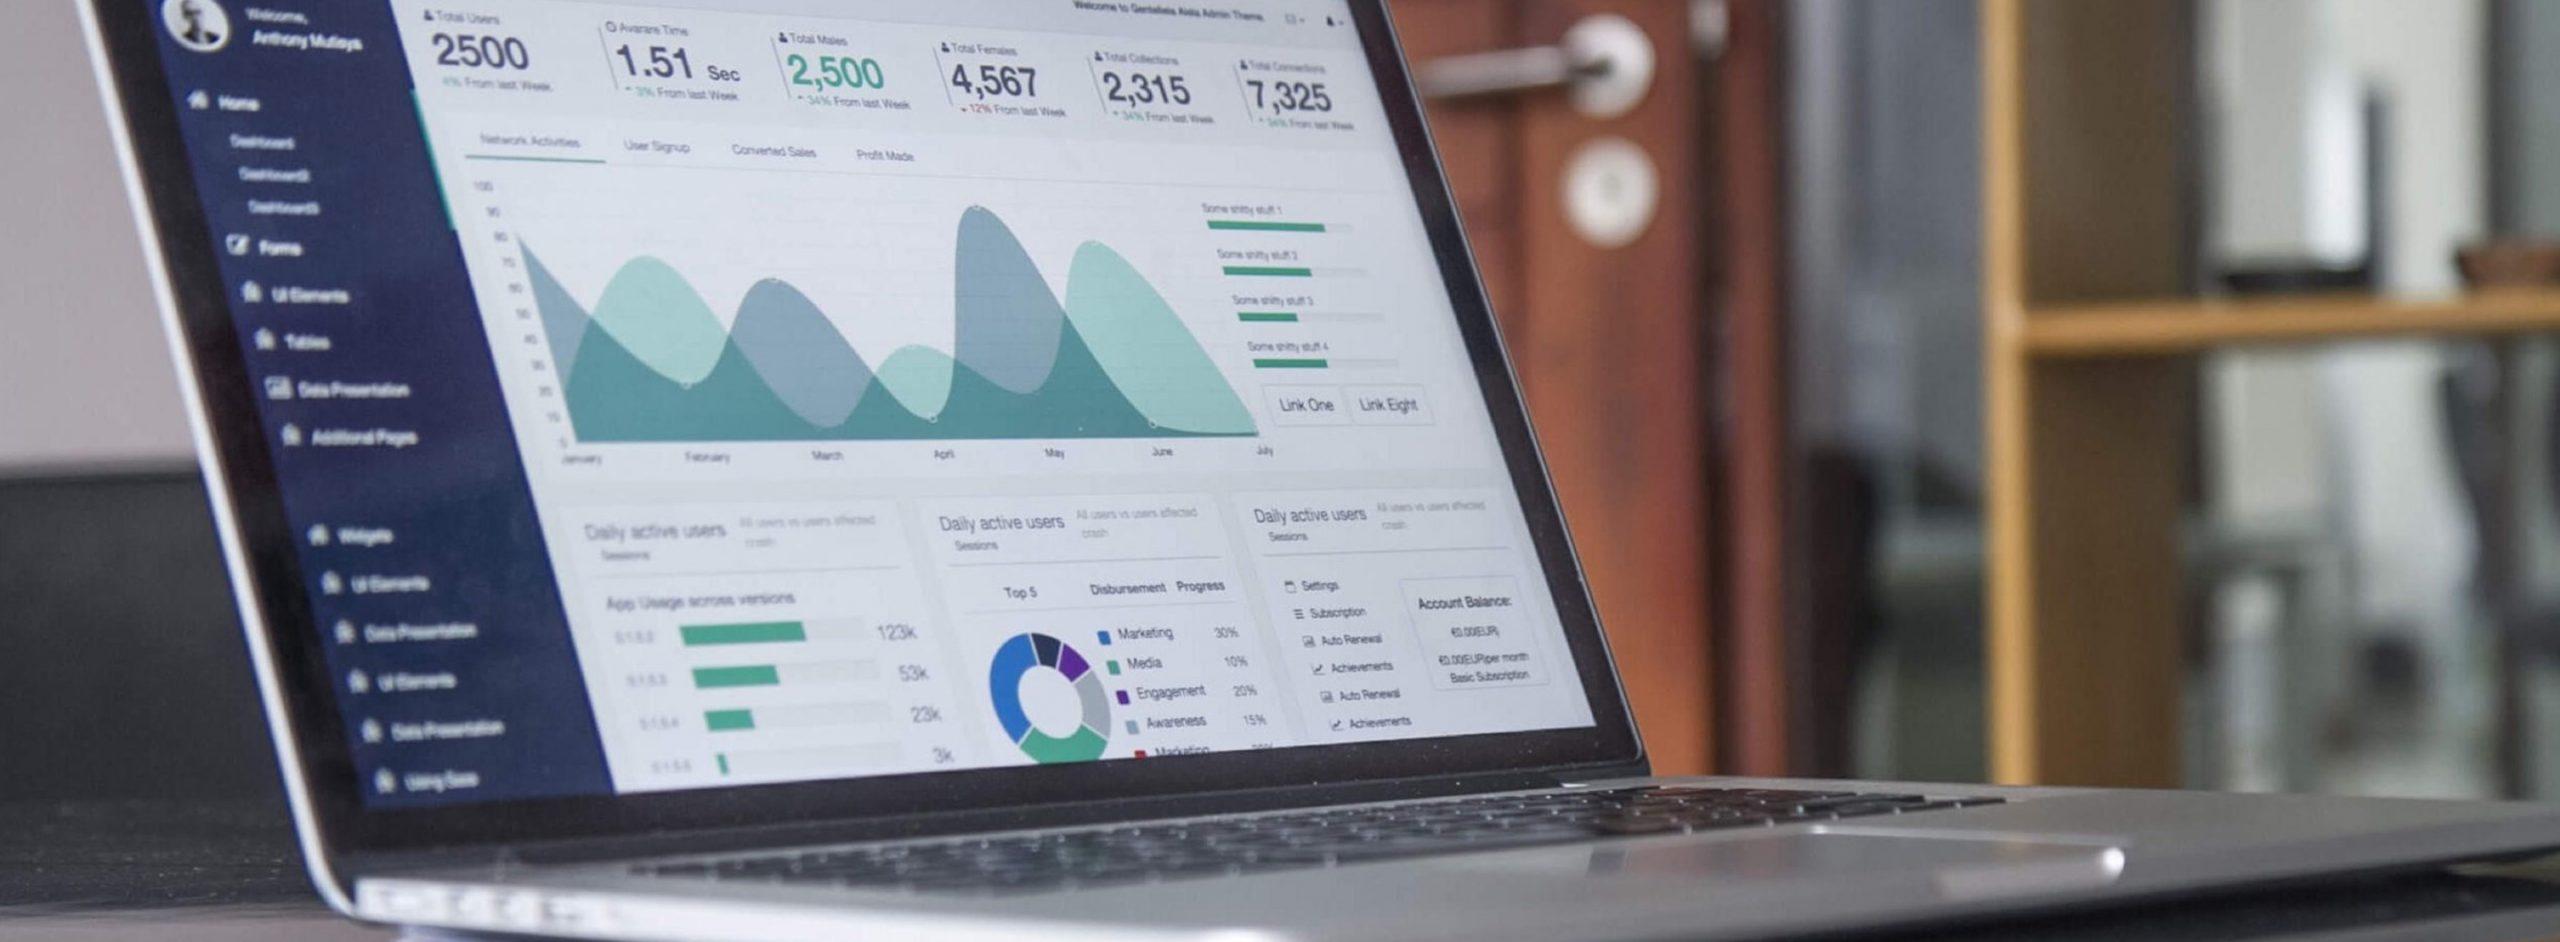 blog-banner-Windows-Azure-and-Java-Metering-multi-tenant-resource-usage-with-Storage-Analytics